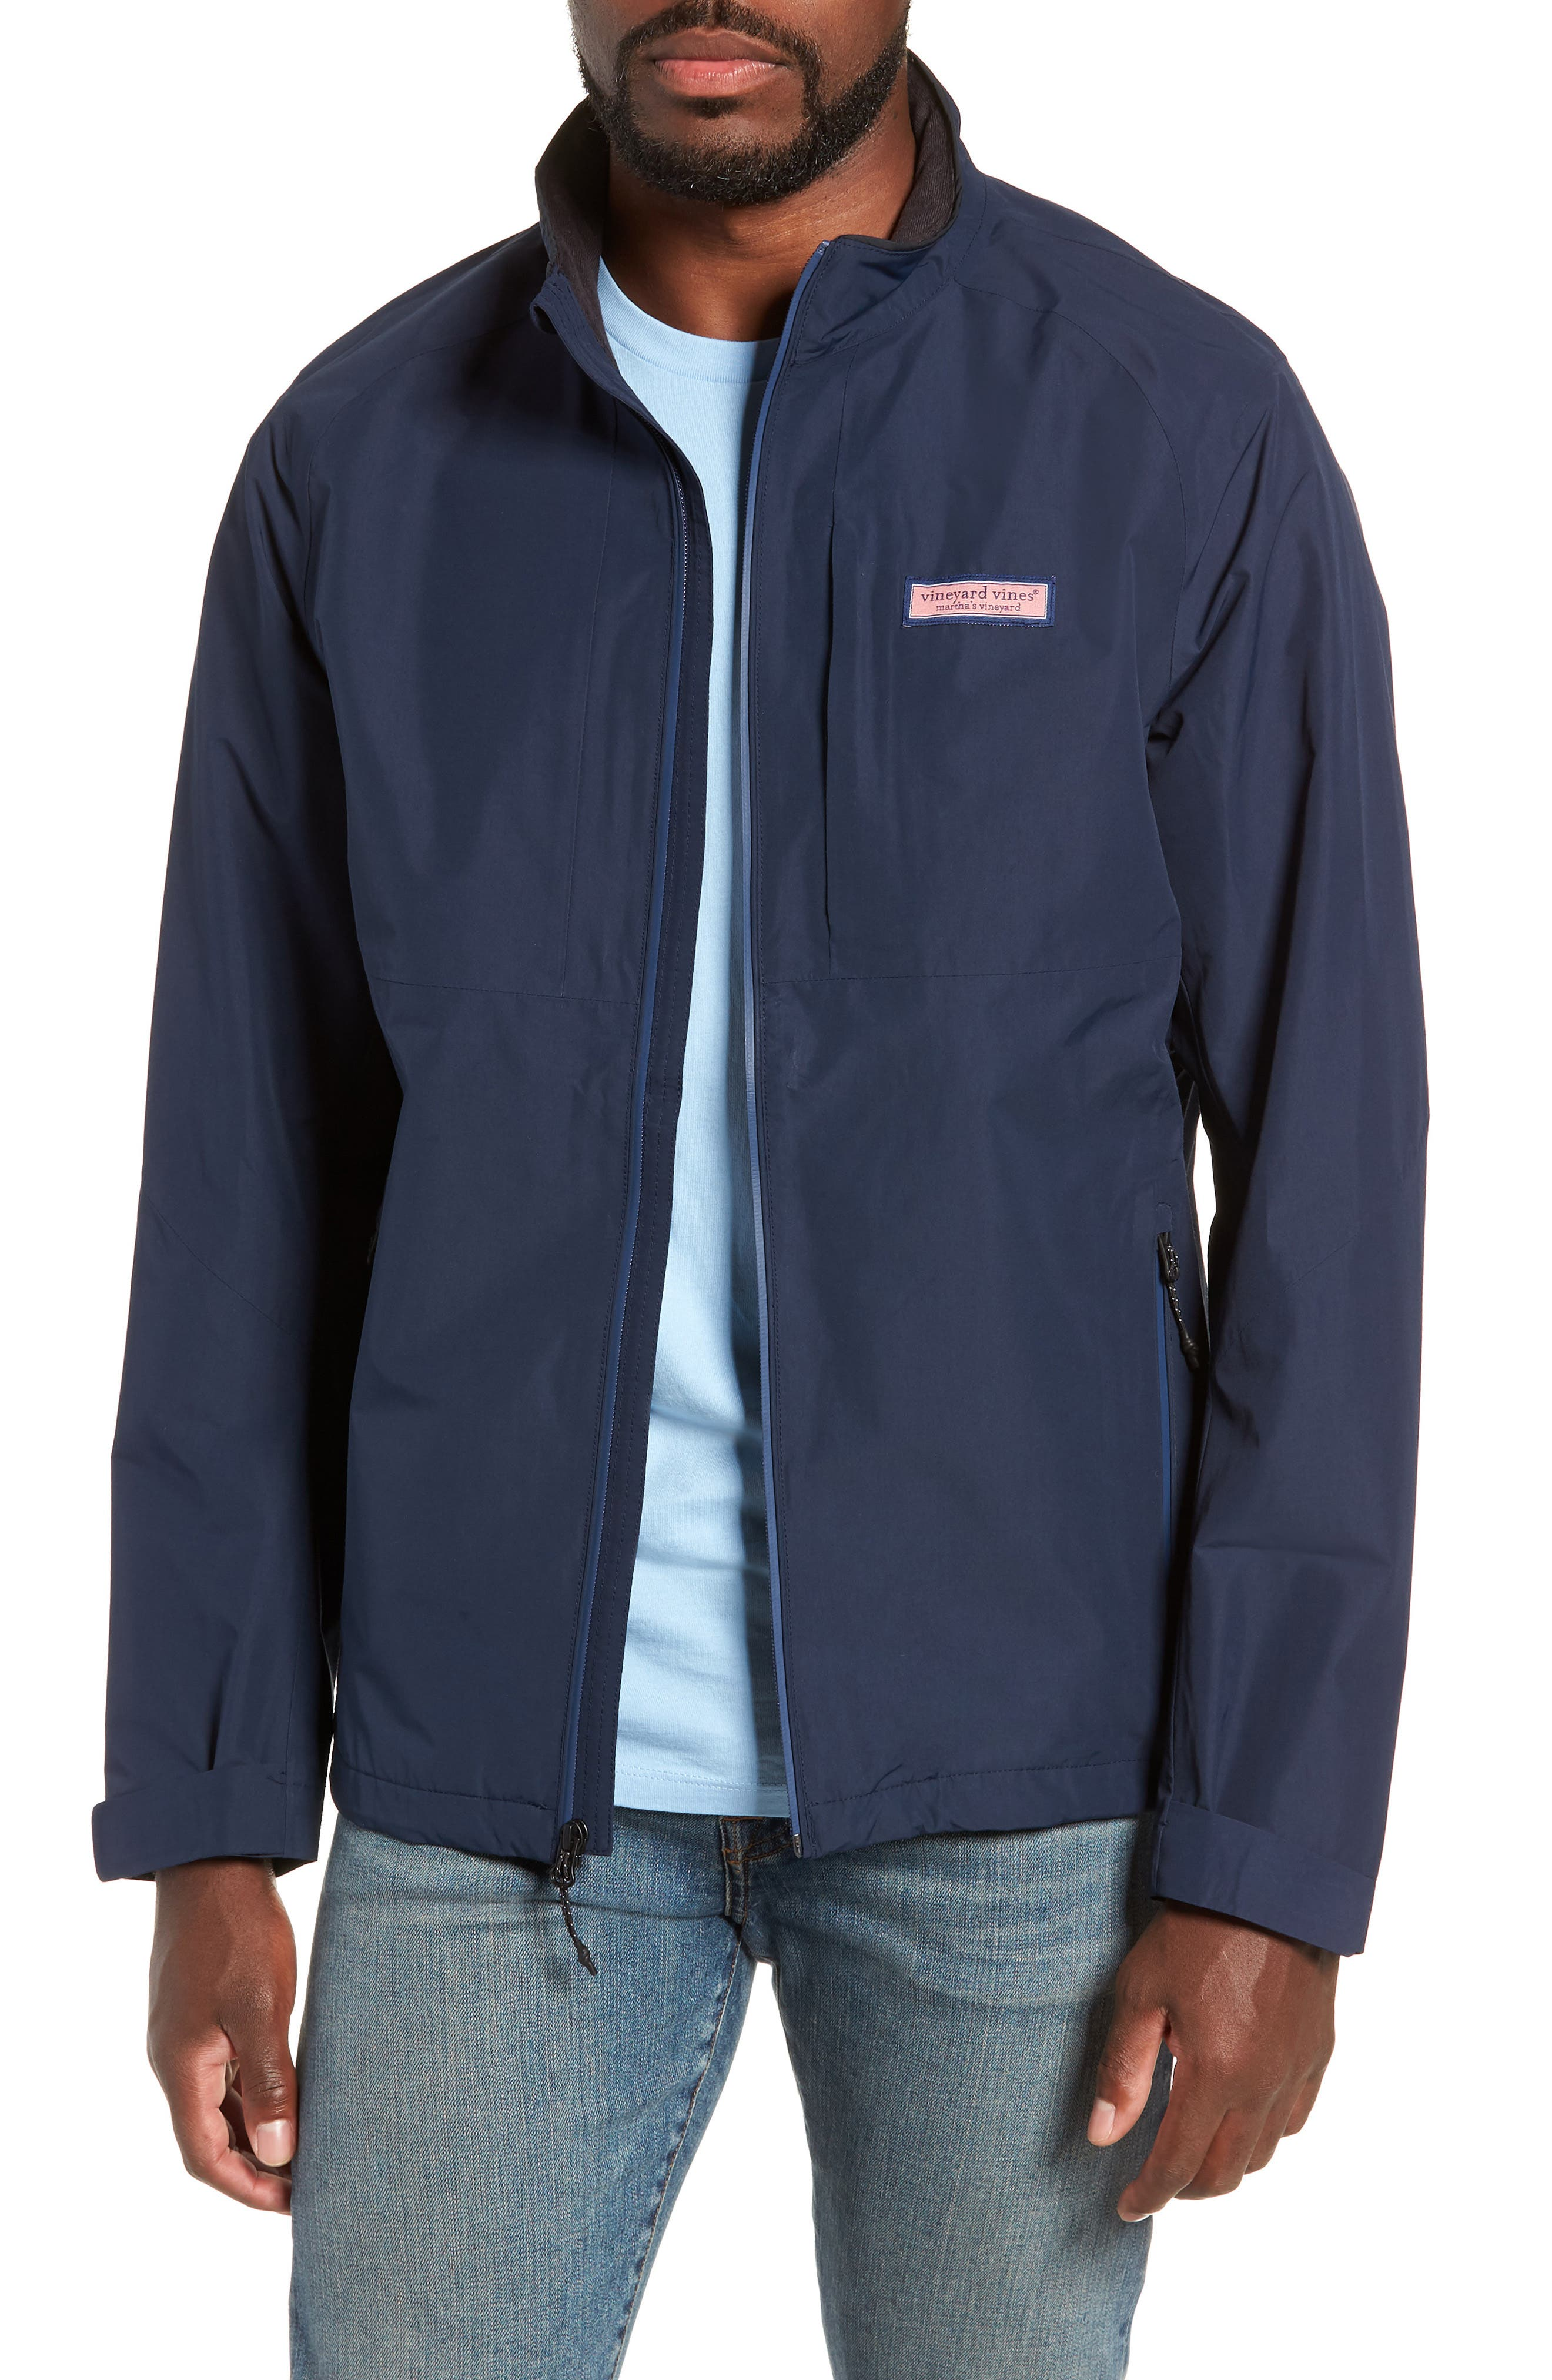 Regatta Performance Jacket,                         Main,                         color, 410